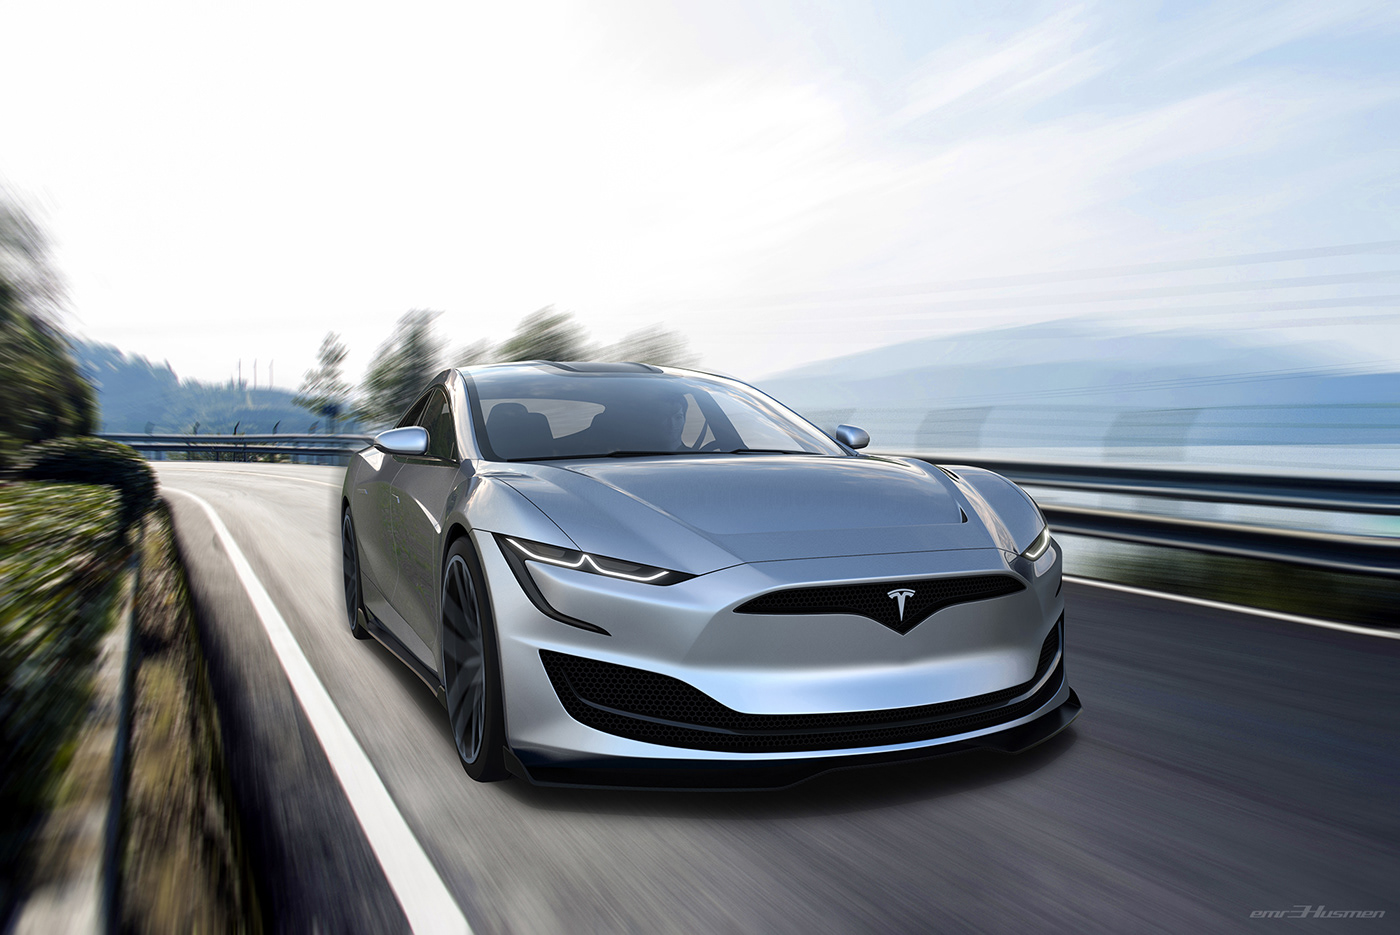 tesla models cardesign emrEHusmen concept future electriccar elonmusk spacex